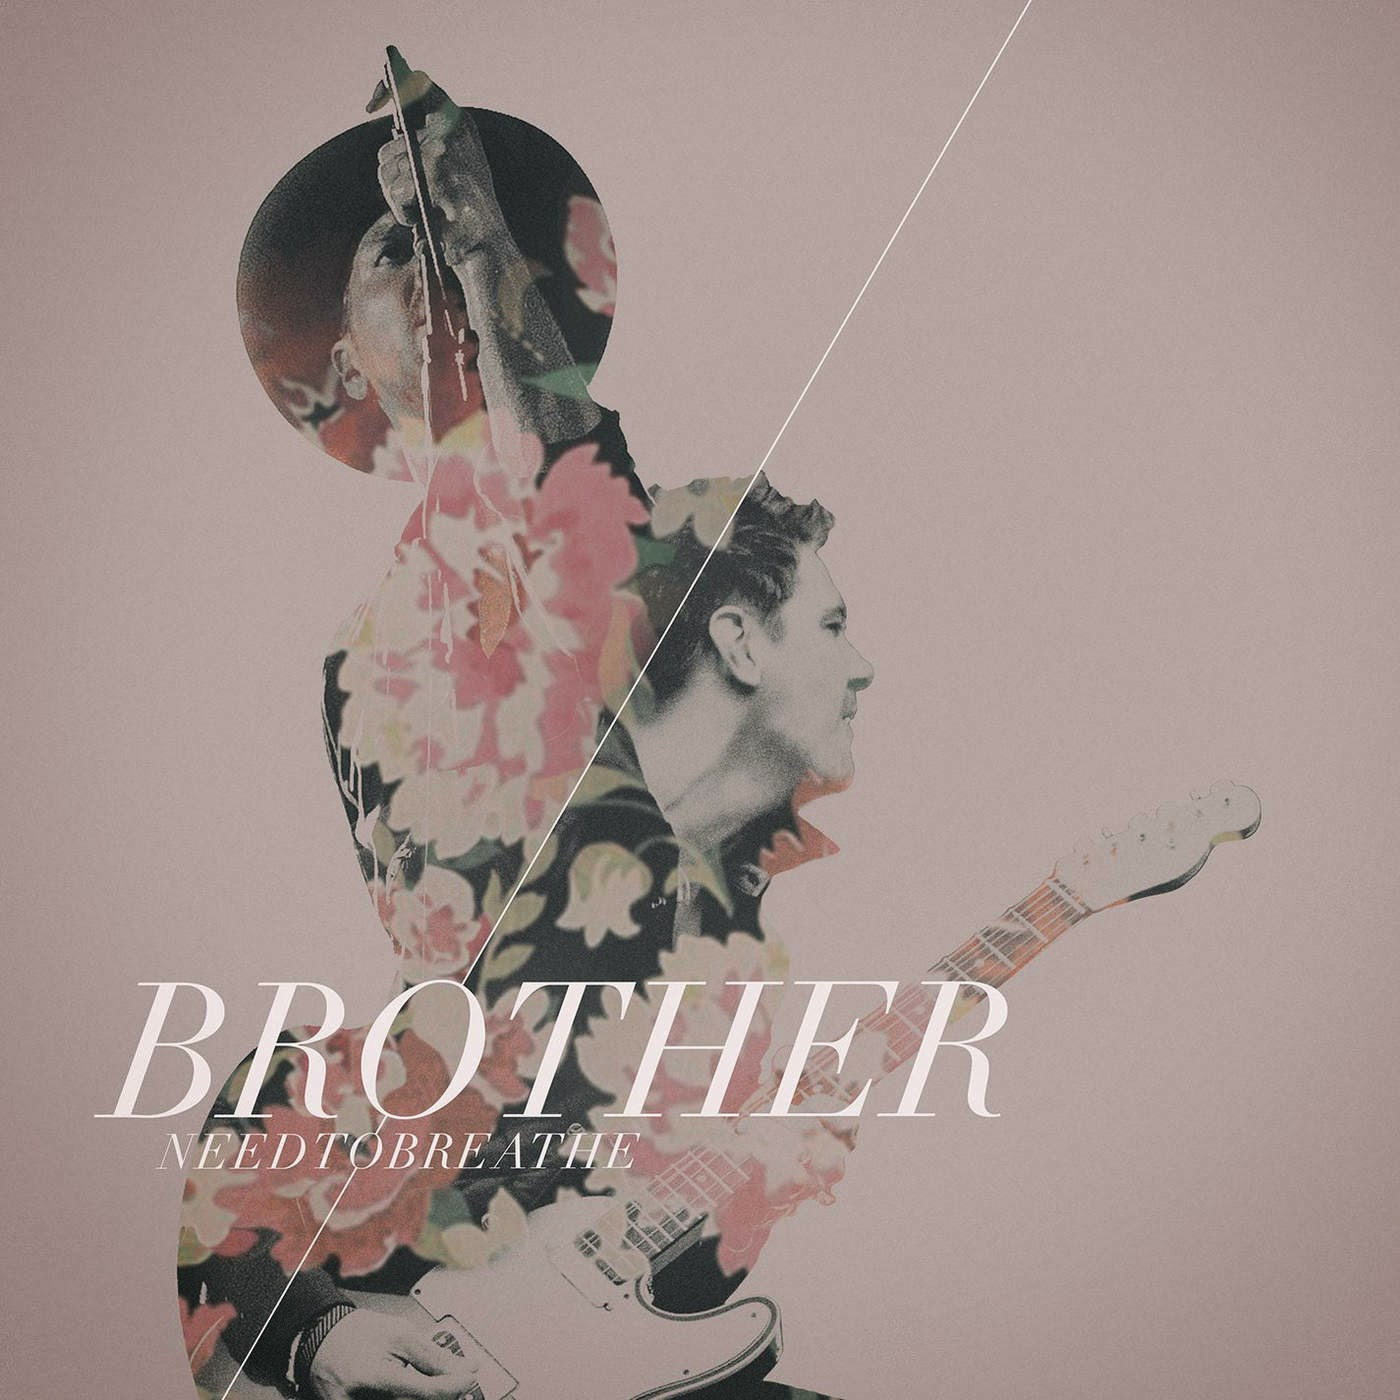 NEEDTOBREATHE - Brother - Single Cover